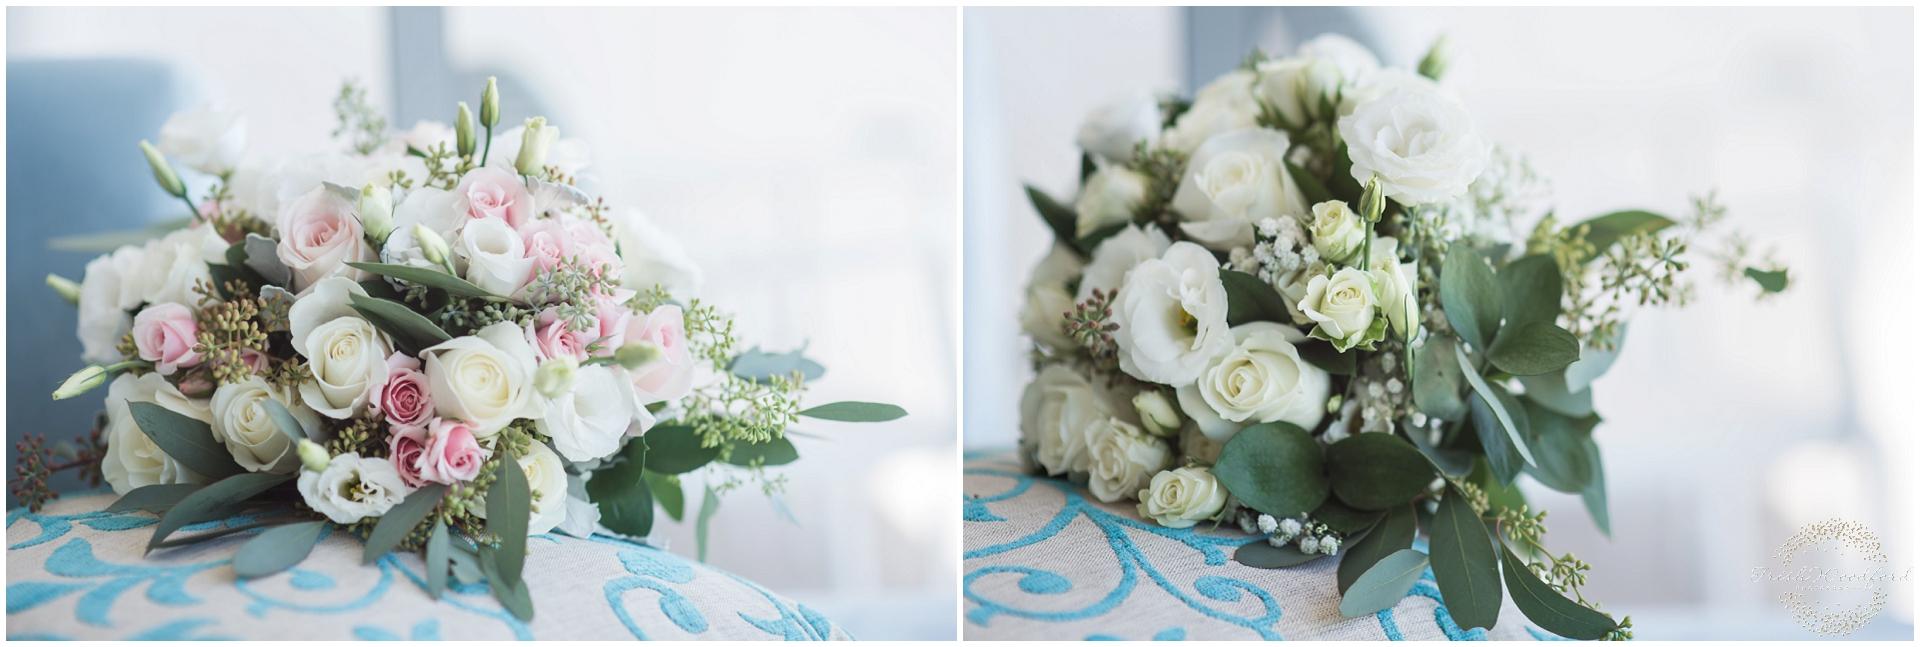 WeddingBouquetsMandurah